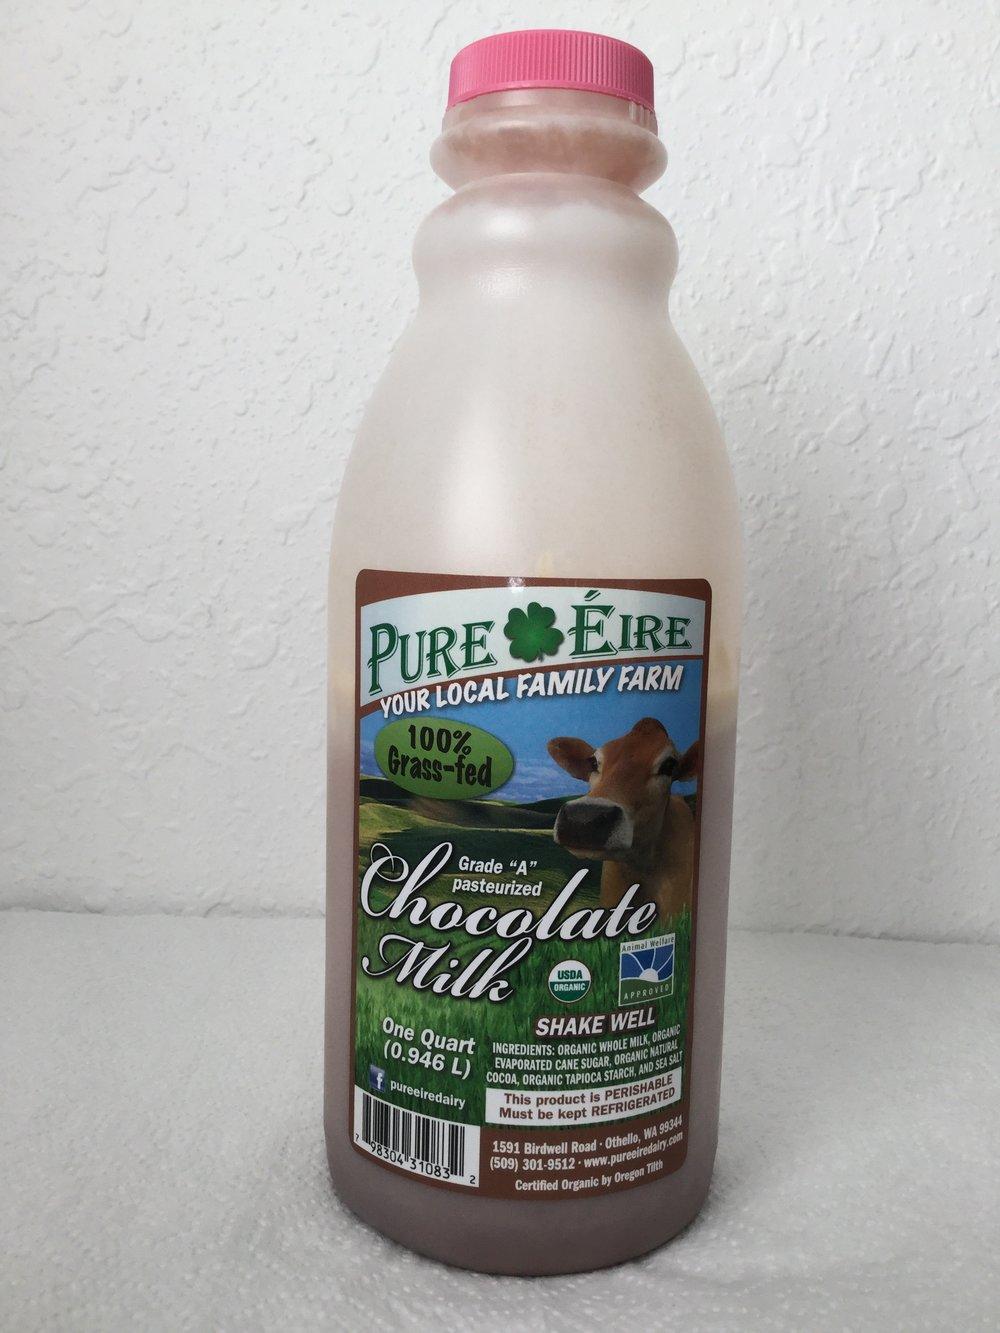 Pure Eire Organic Chocolate Milk Side 4